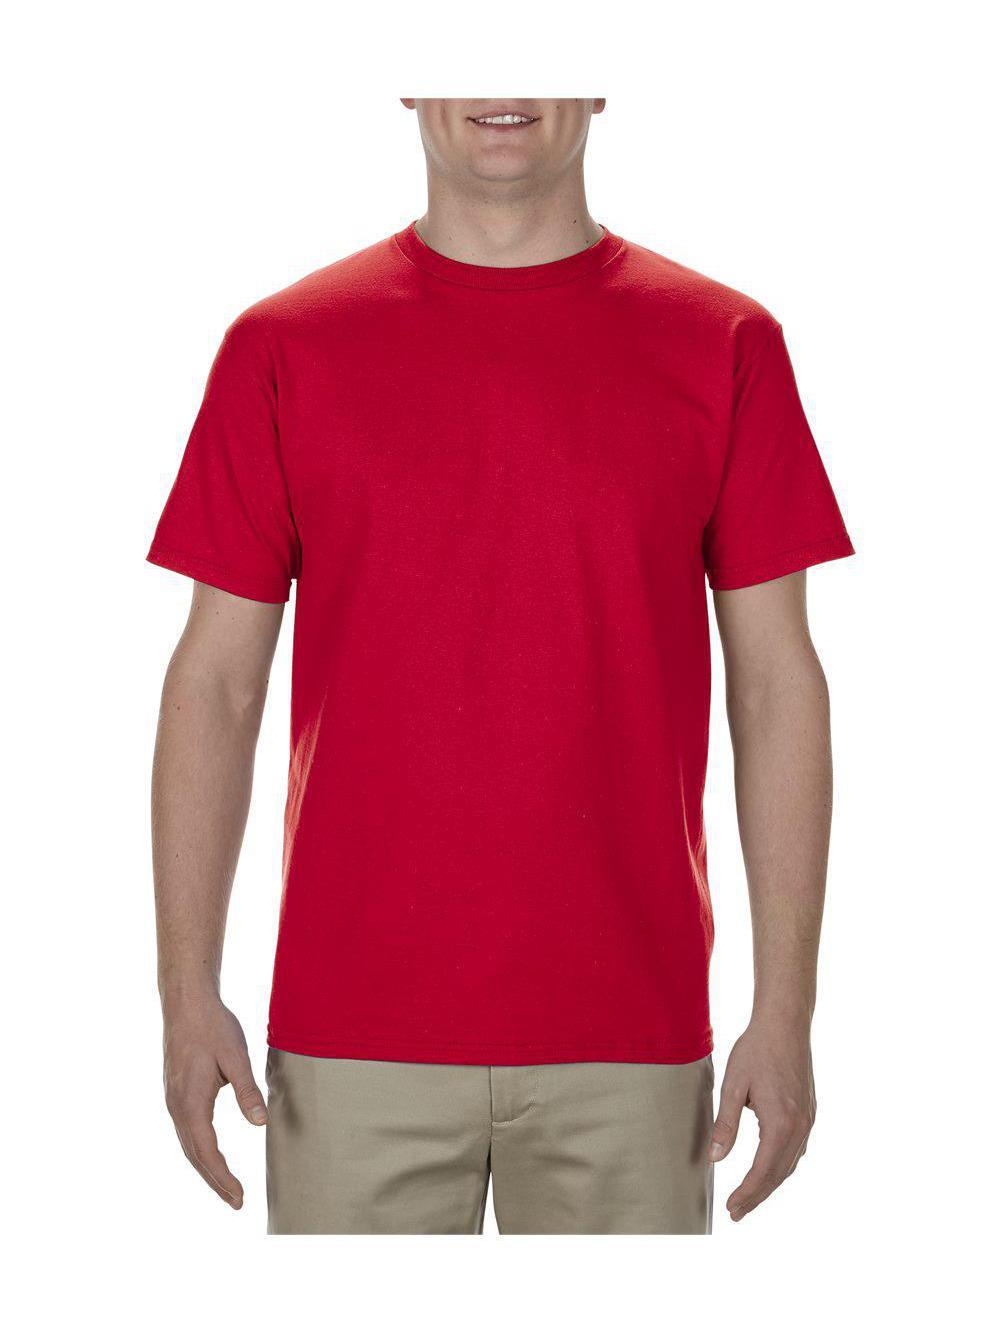 ALSTYLE-Premium-T-Shirt-1701 thumbnail 43